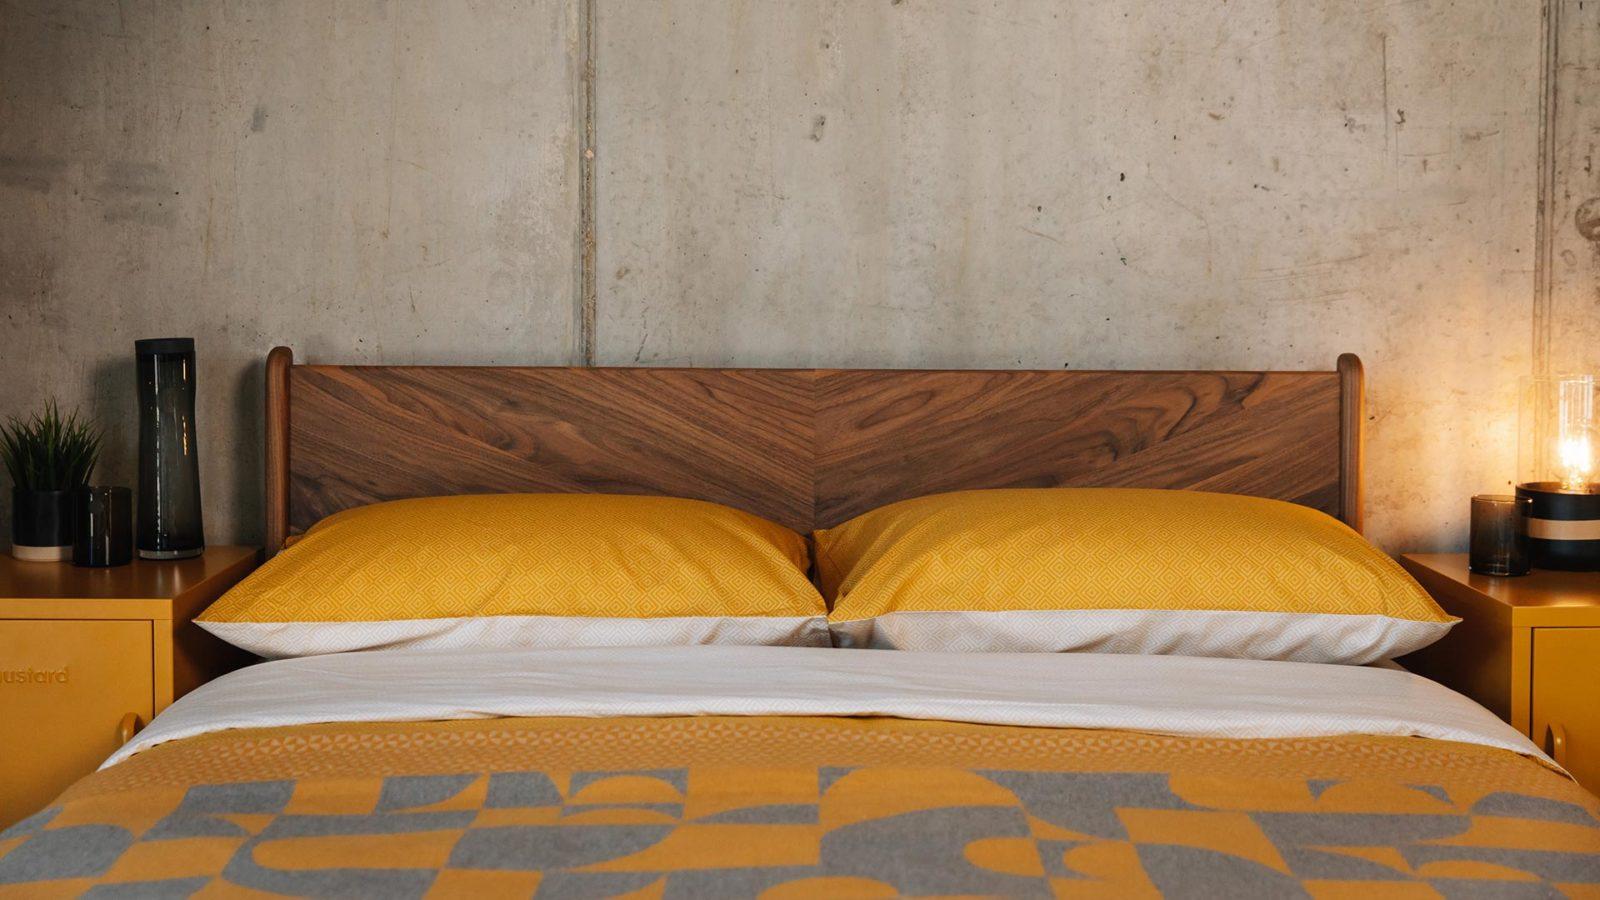 yolk yellow bedding against our chevron patterned walnut Hoxton headboard